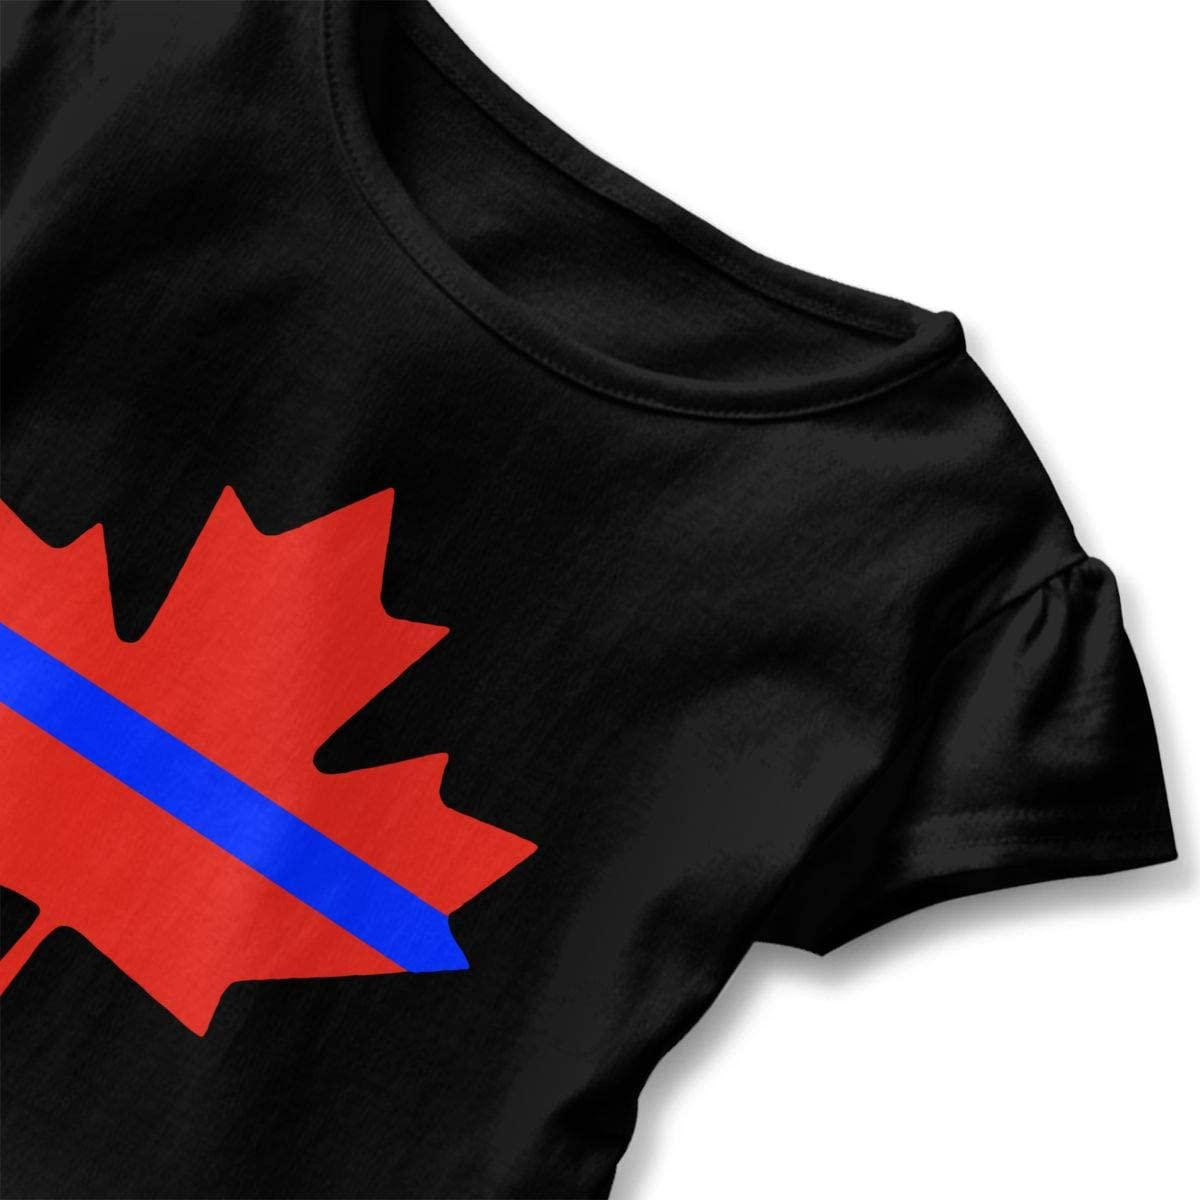 2-6T Zi7J9q-0 Short-Sleeve Thin Blue Line Canada Maple Shirts for Girls Casual Sweatshirt with Falbala